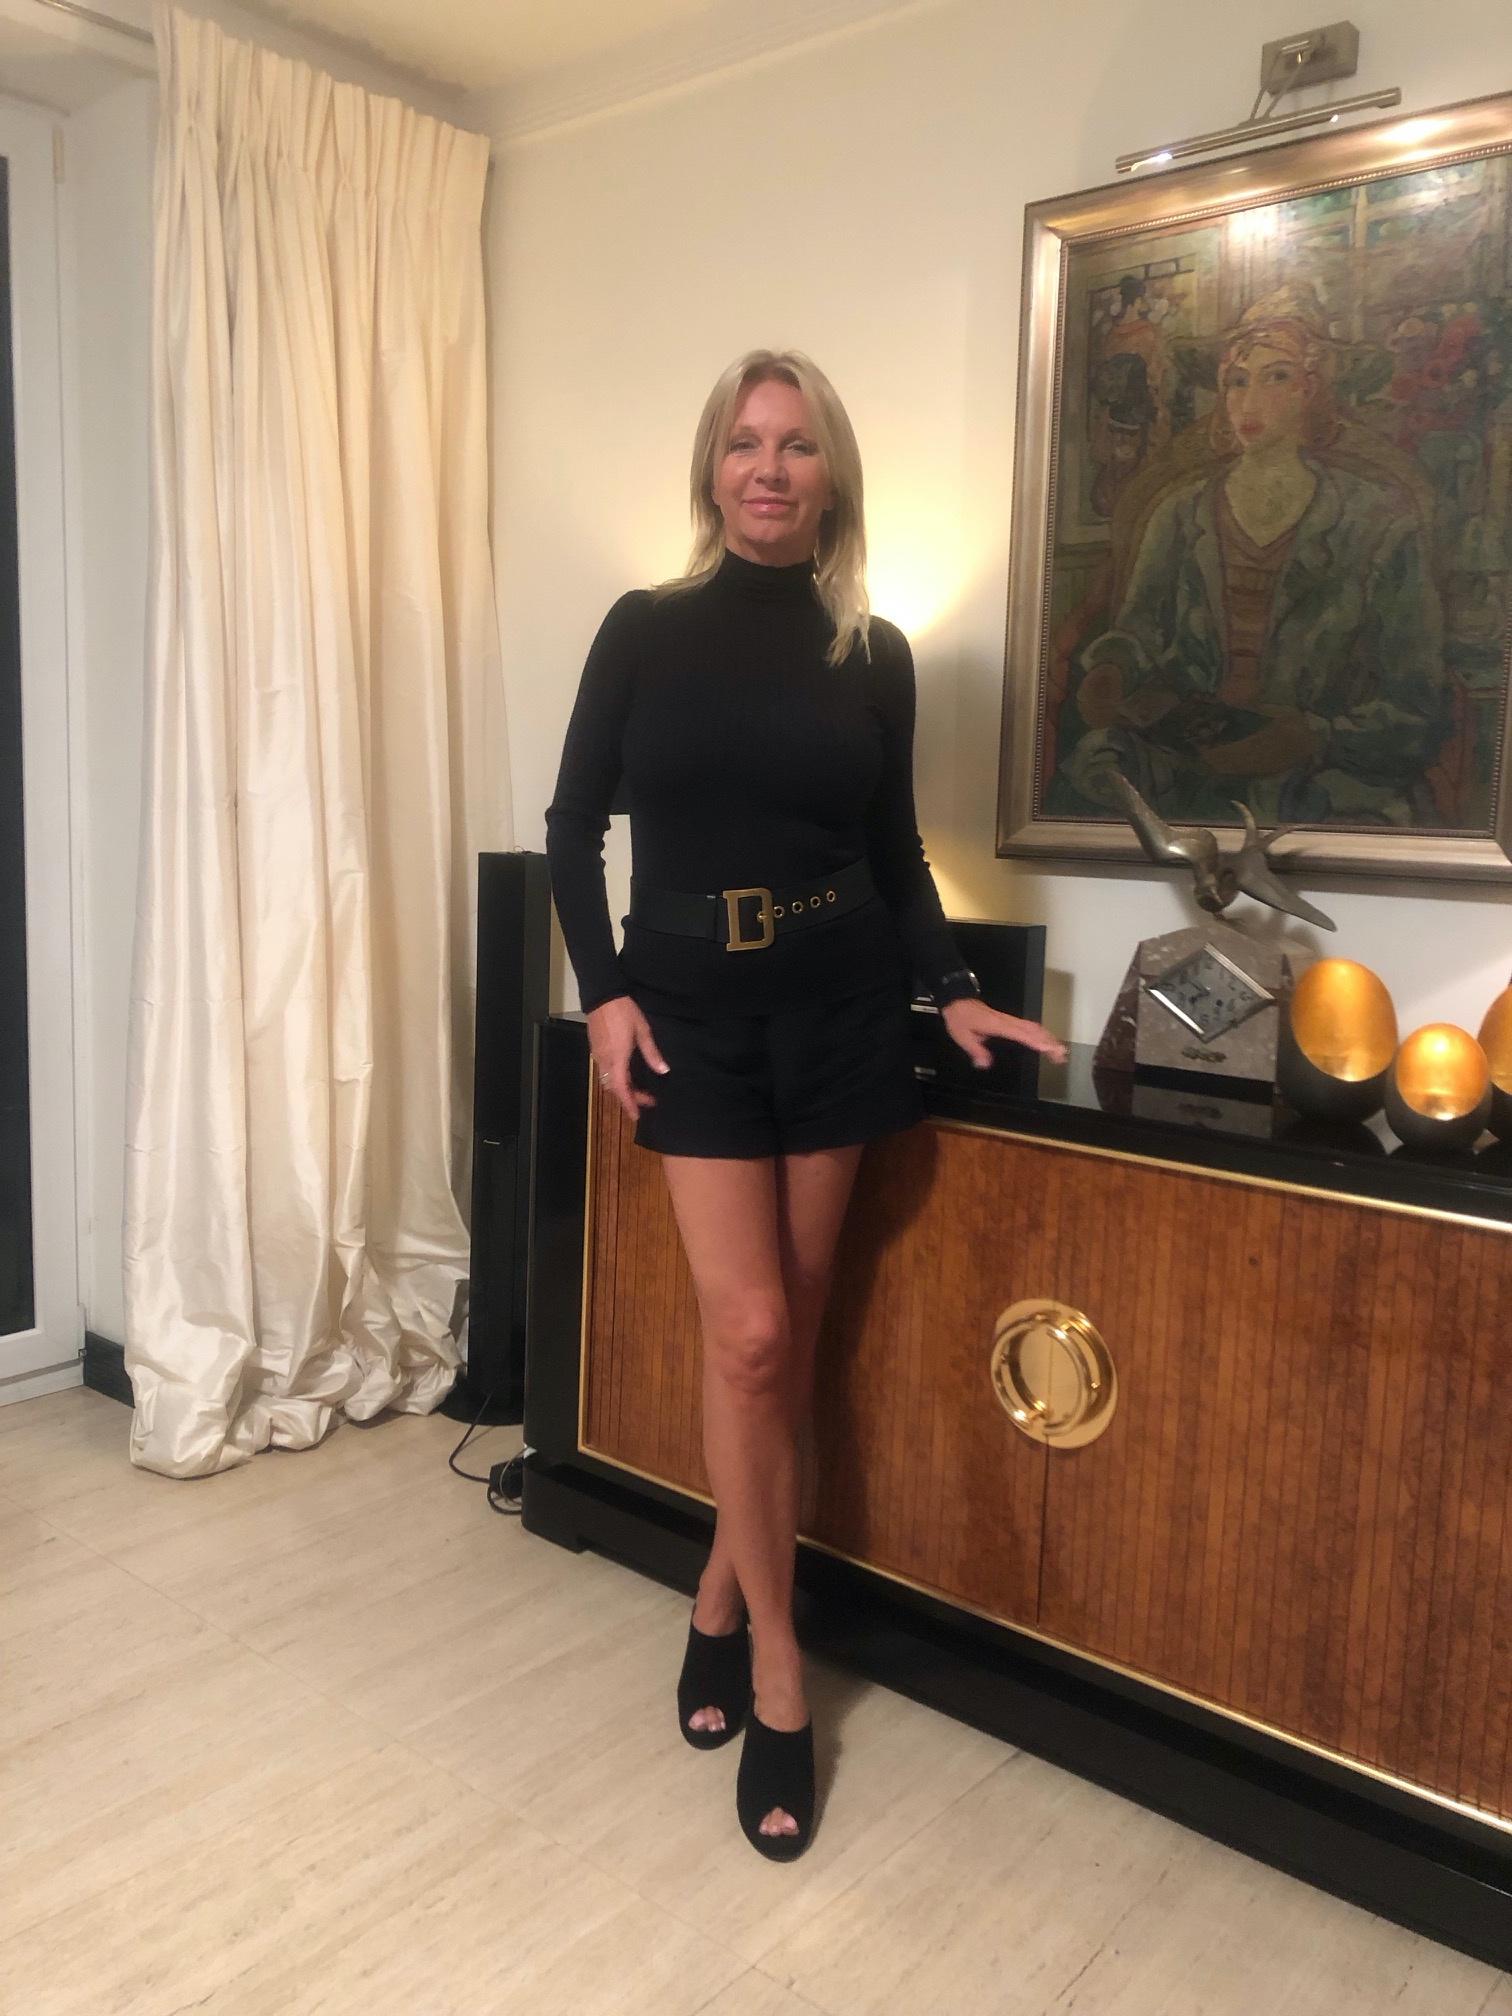 BlogStar: Mariola Bojarska-Ferenc, czyli kobieta luksusowa - BlogStar.pl